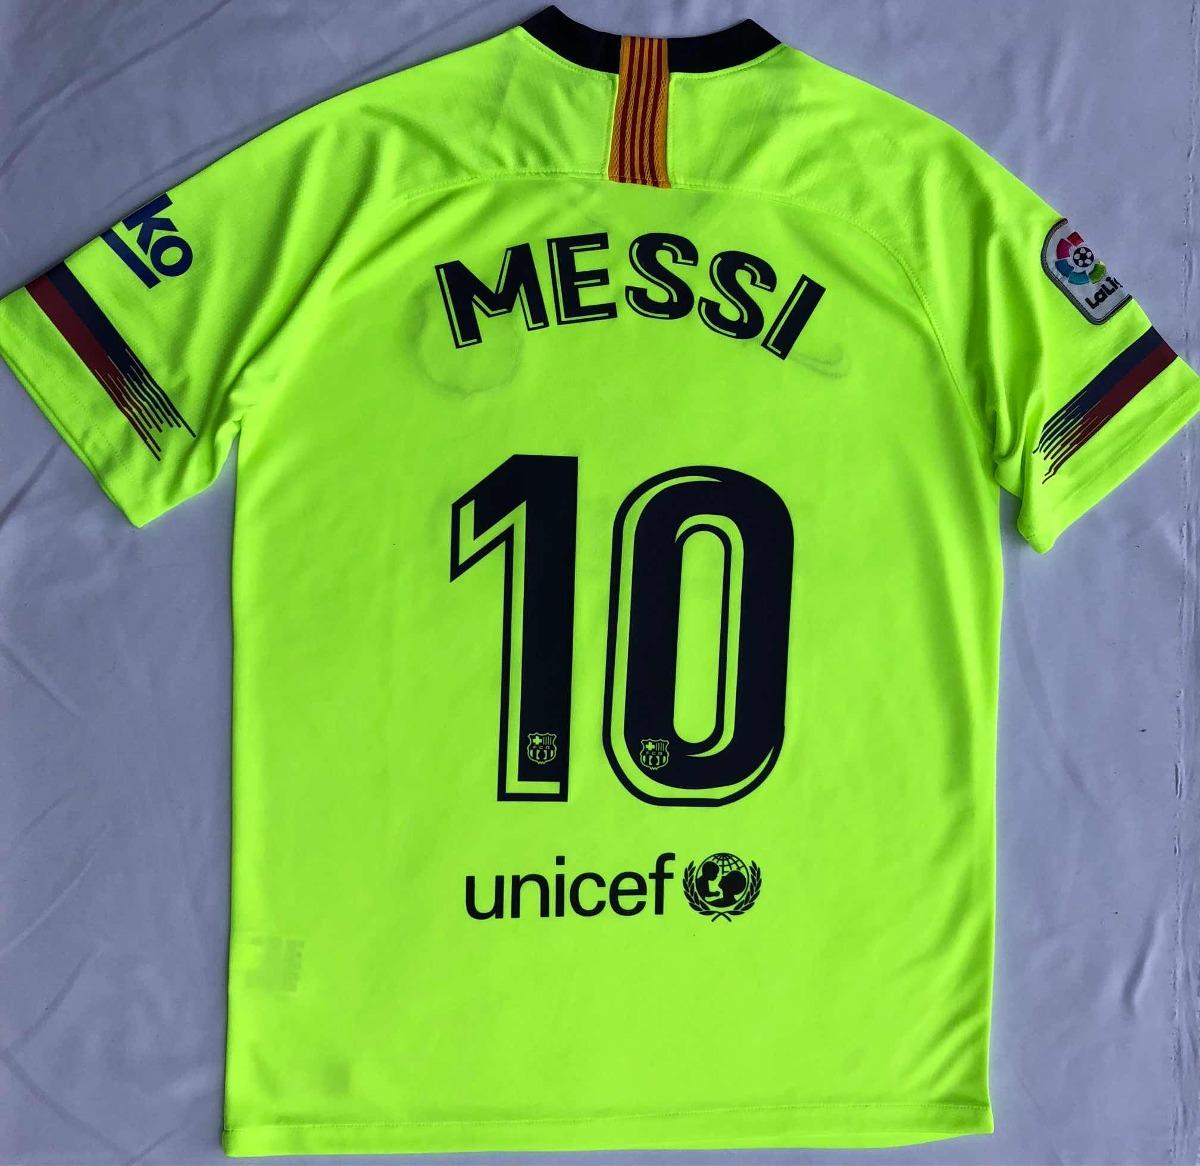 Jersey Playera Fc Barcelona Visita Messi 2018-2019 -   659.00 en ... e46b0978193